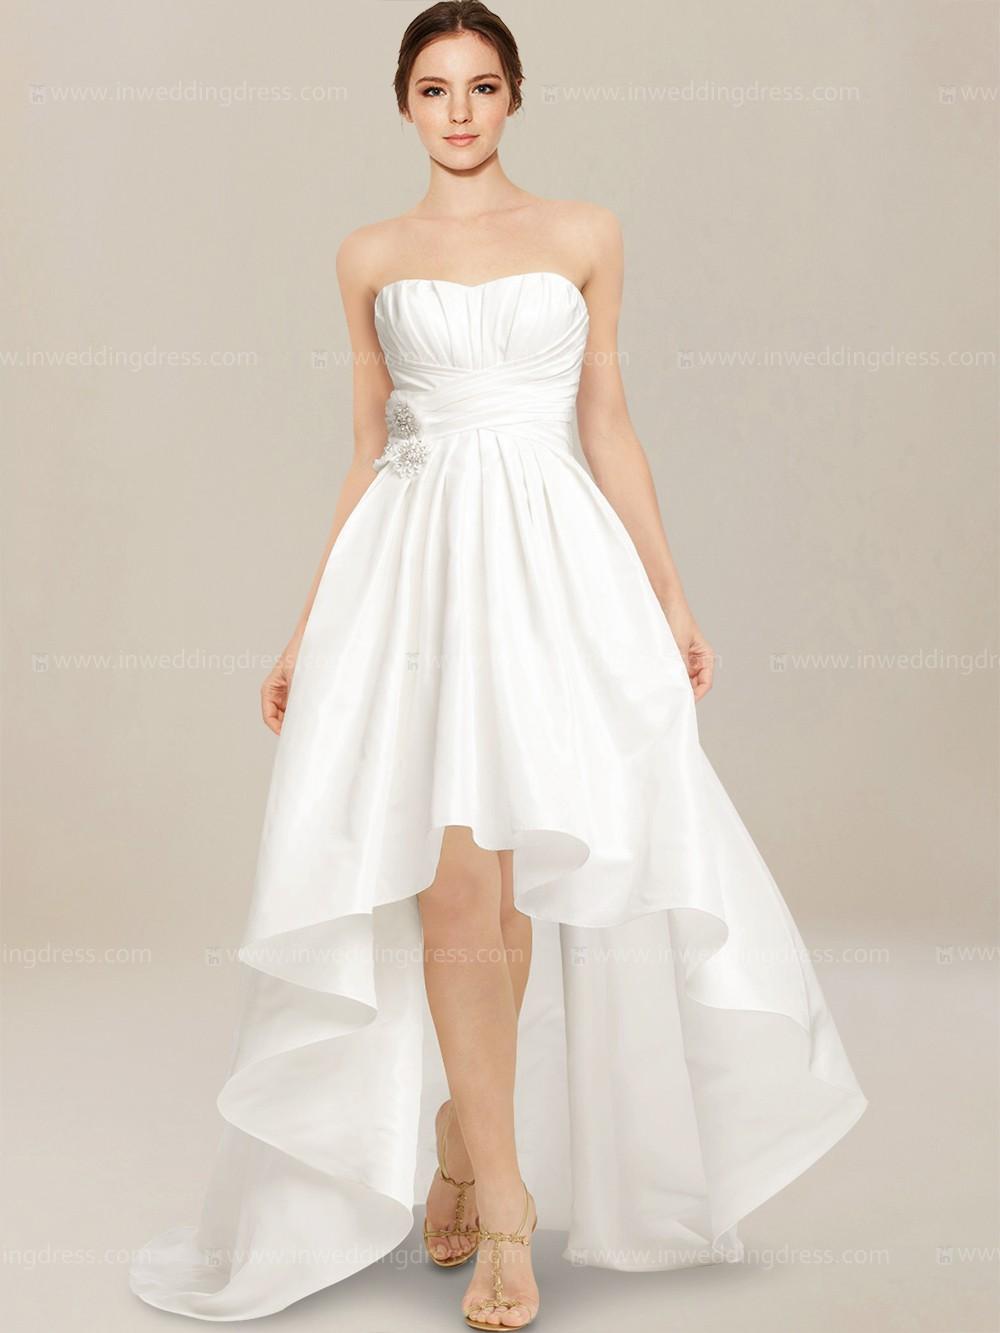 short flowy wedding dresses photo - 1